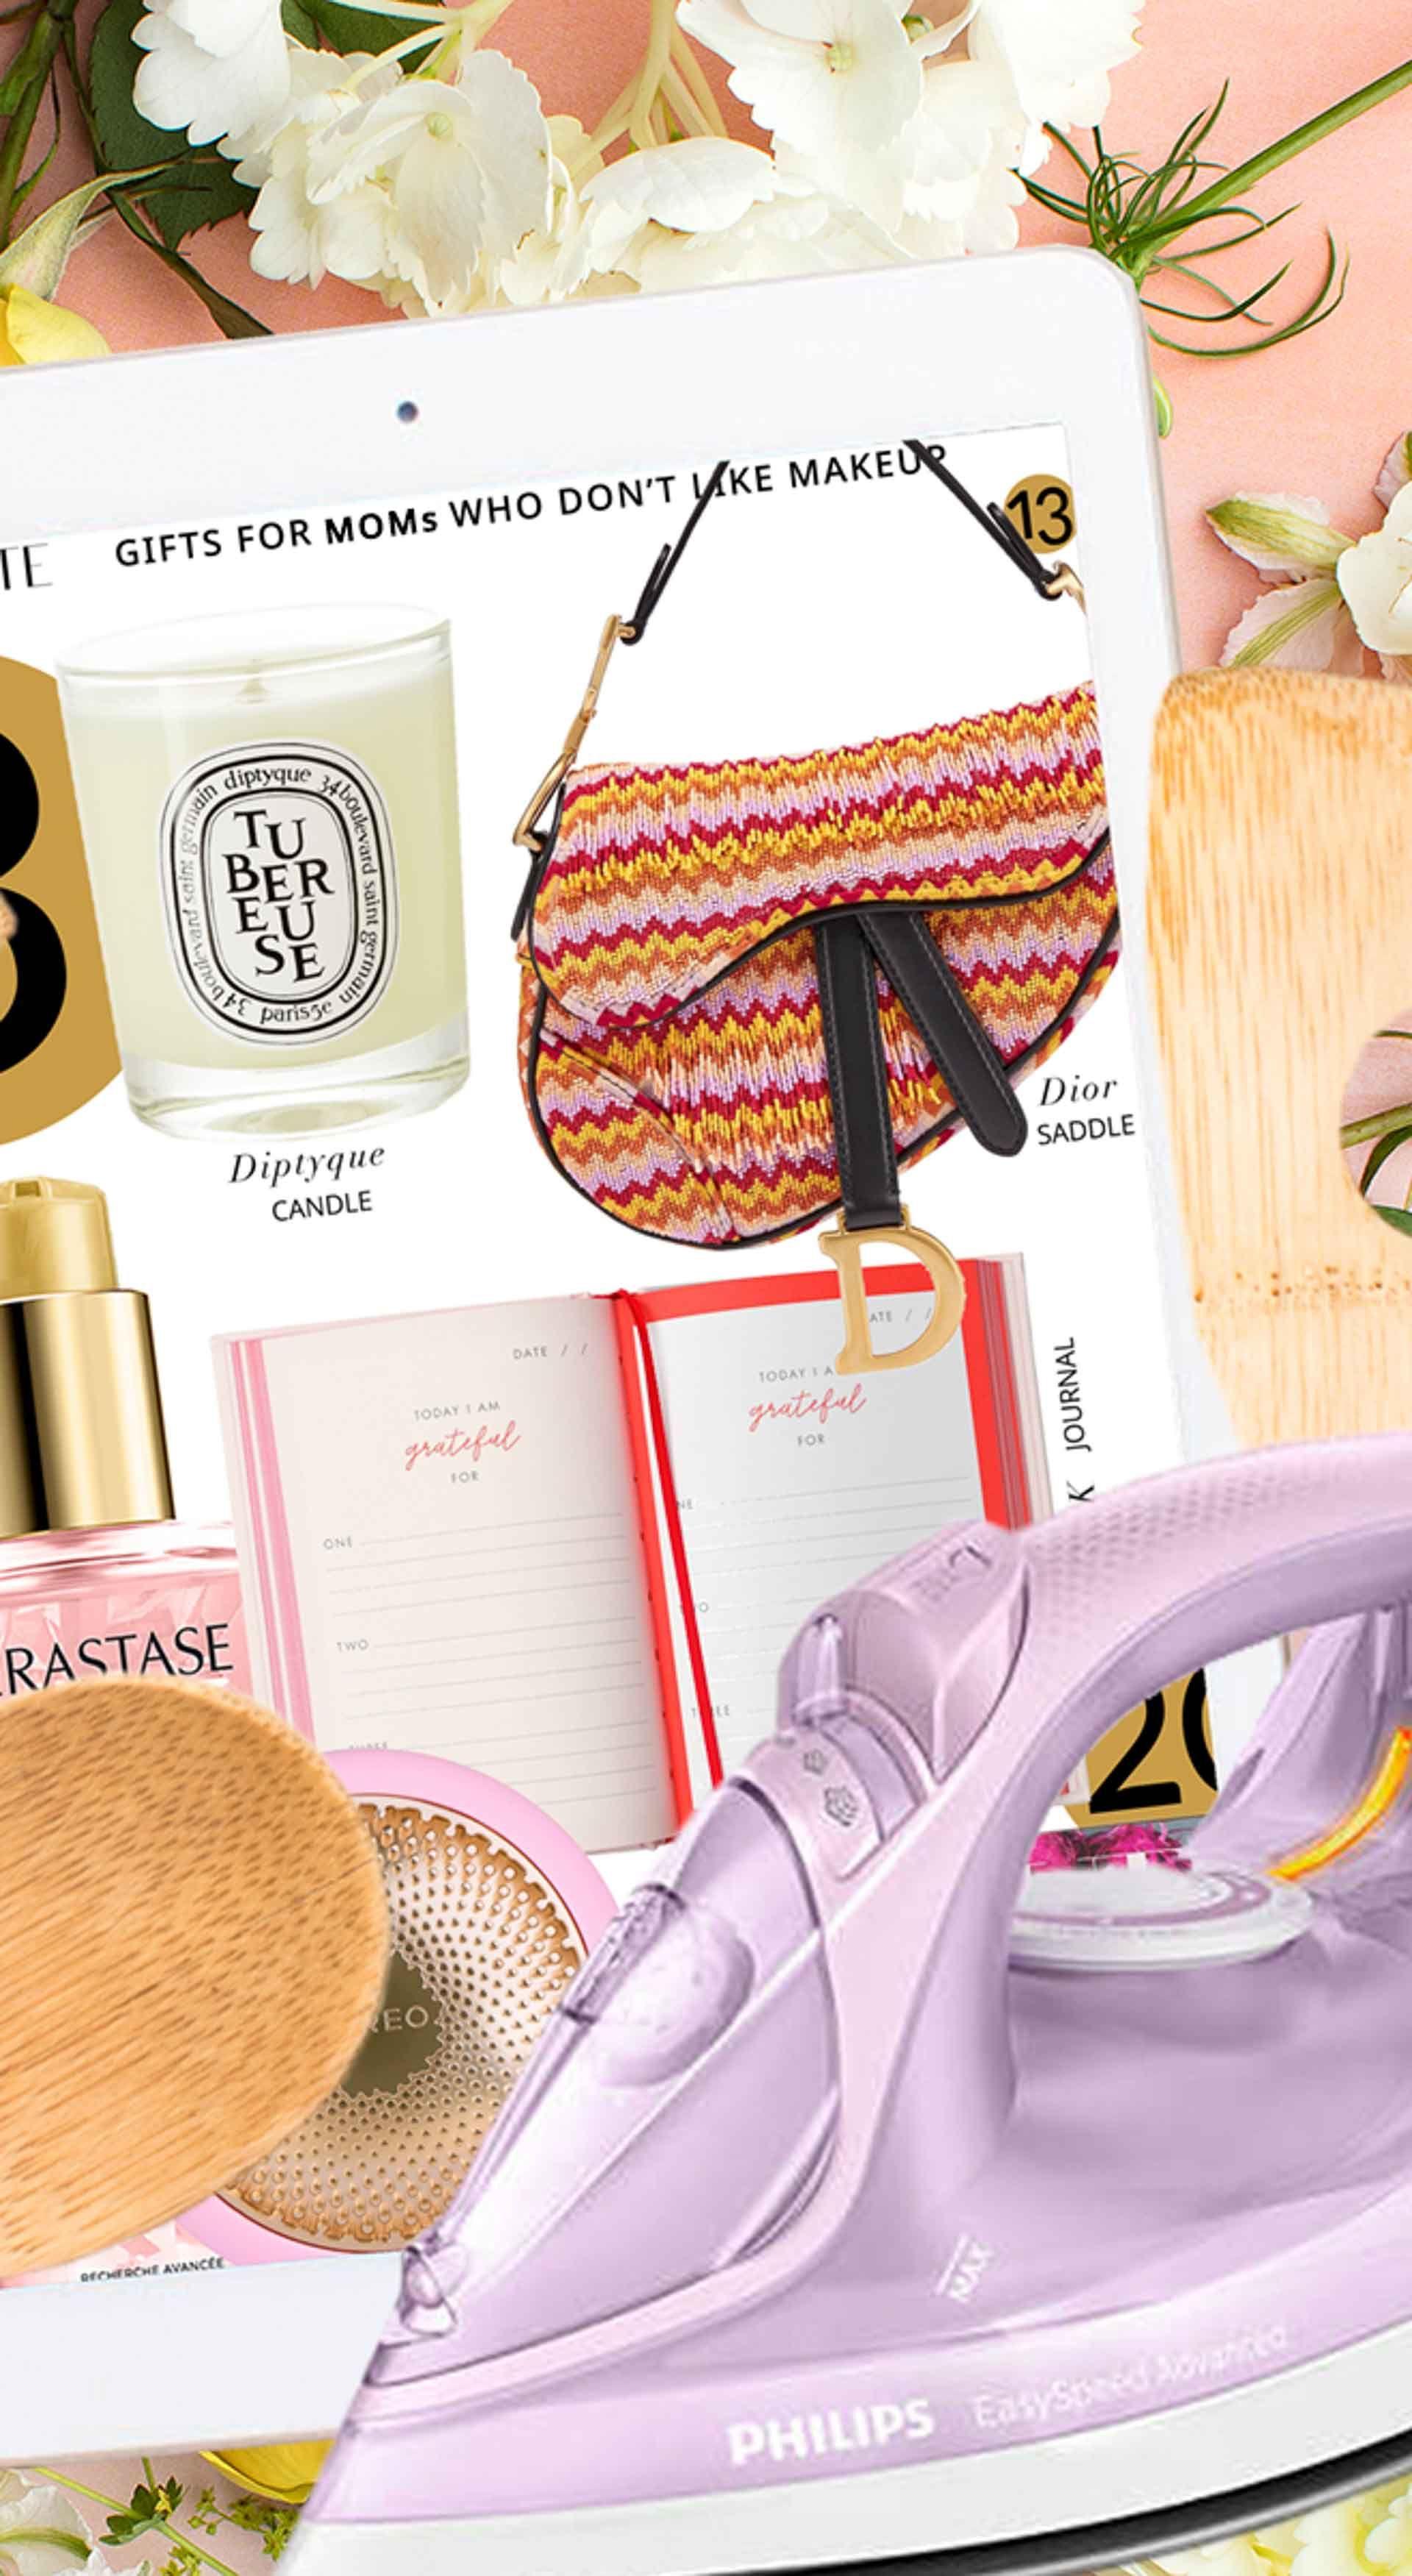 Fashion Blogger Veronika Lipar of Brunette from Wall Street sharing best no makeup gifts for mum #giftsforher #mothersday #mothersdaygift